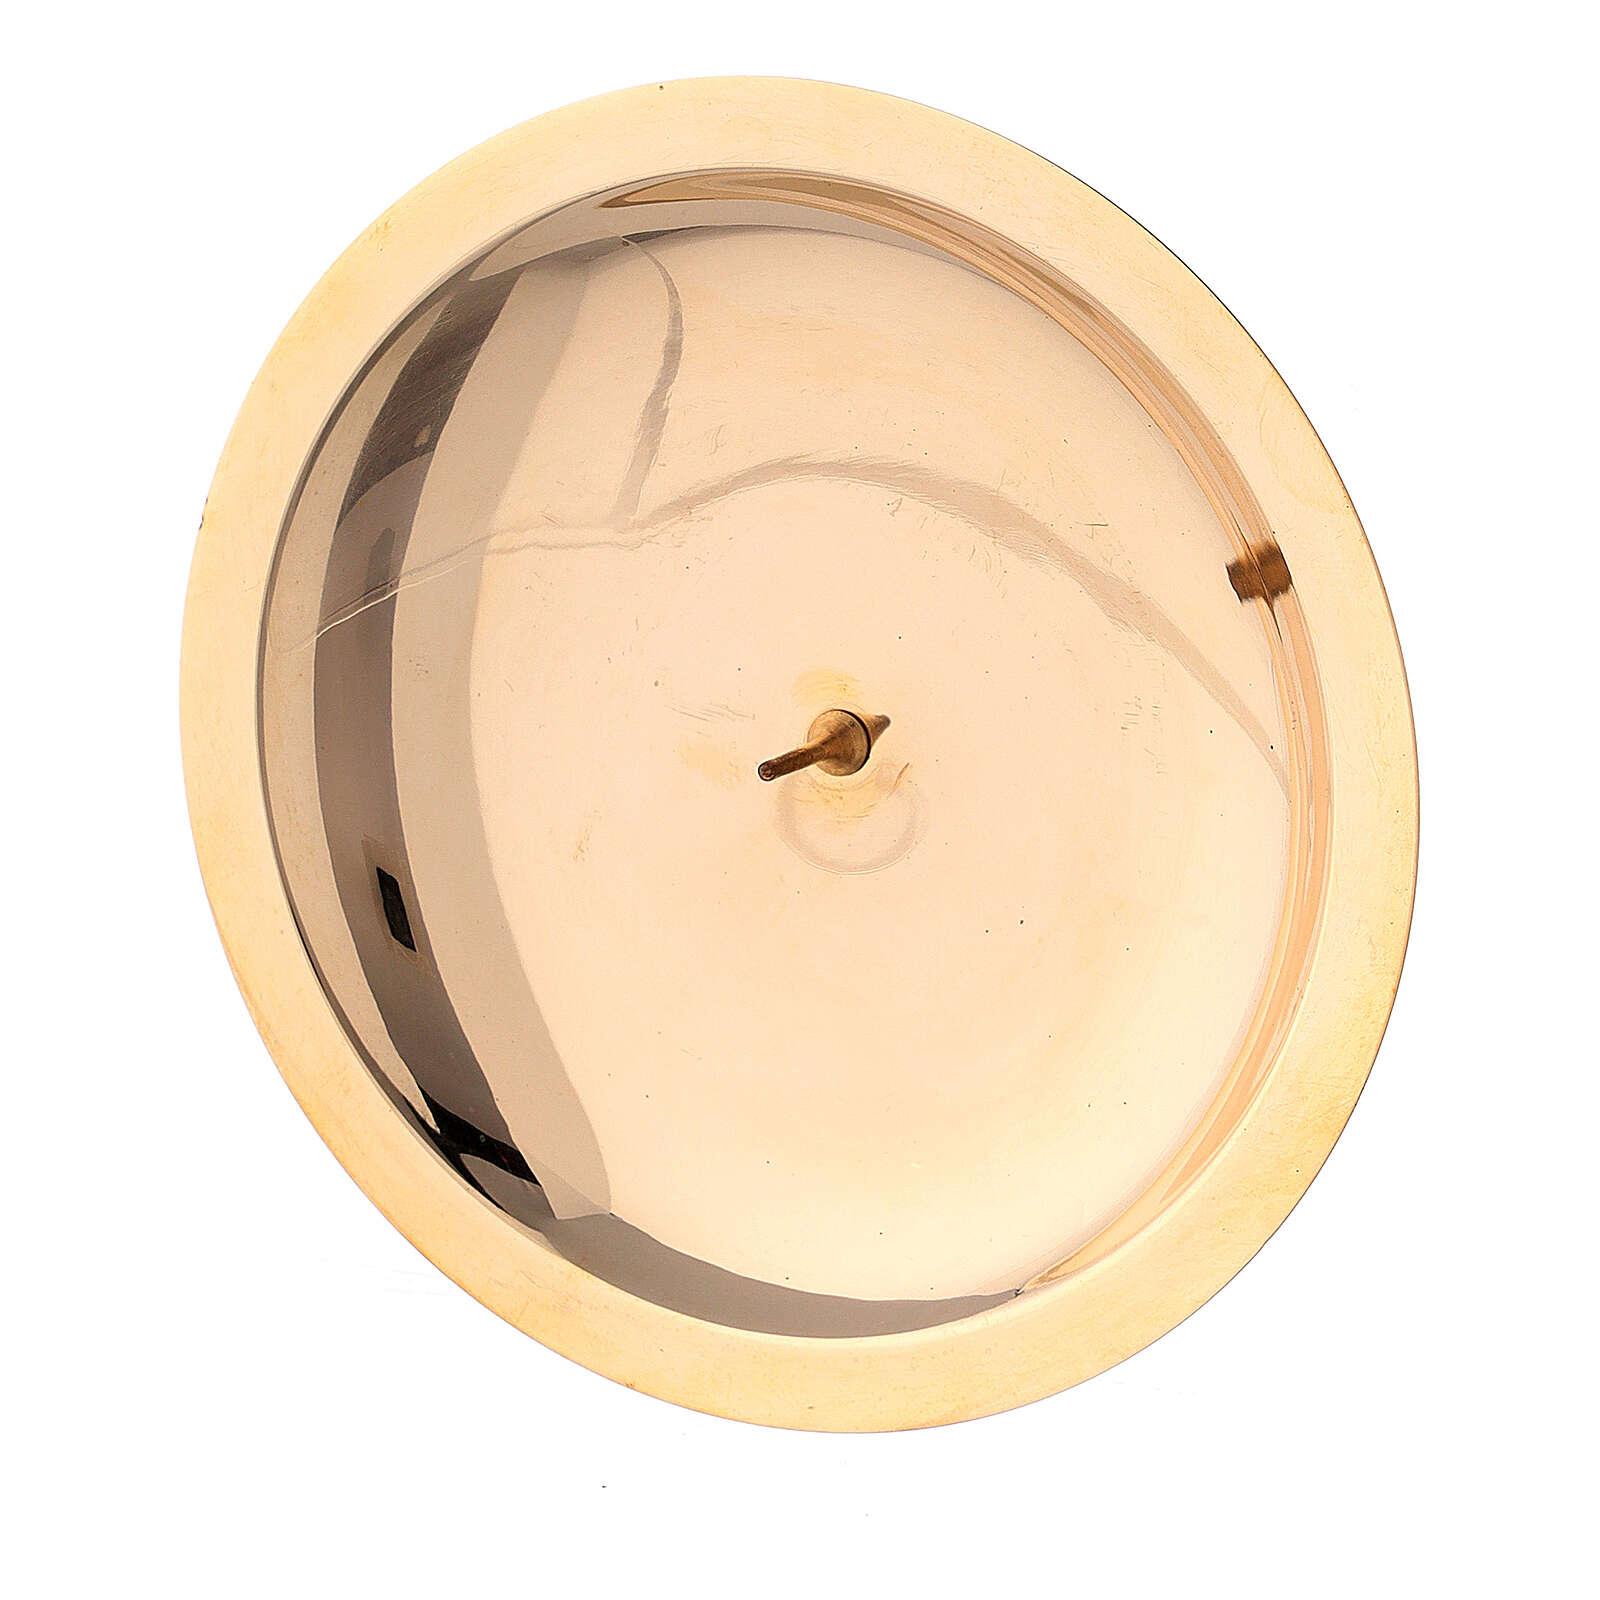 Piatto portacandela punzone ottone lucido 10 cm 4